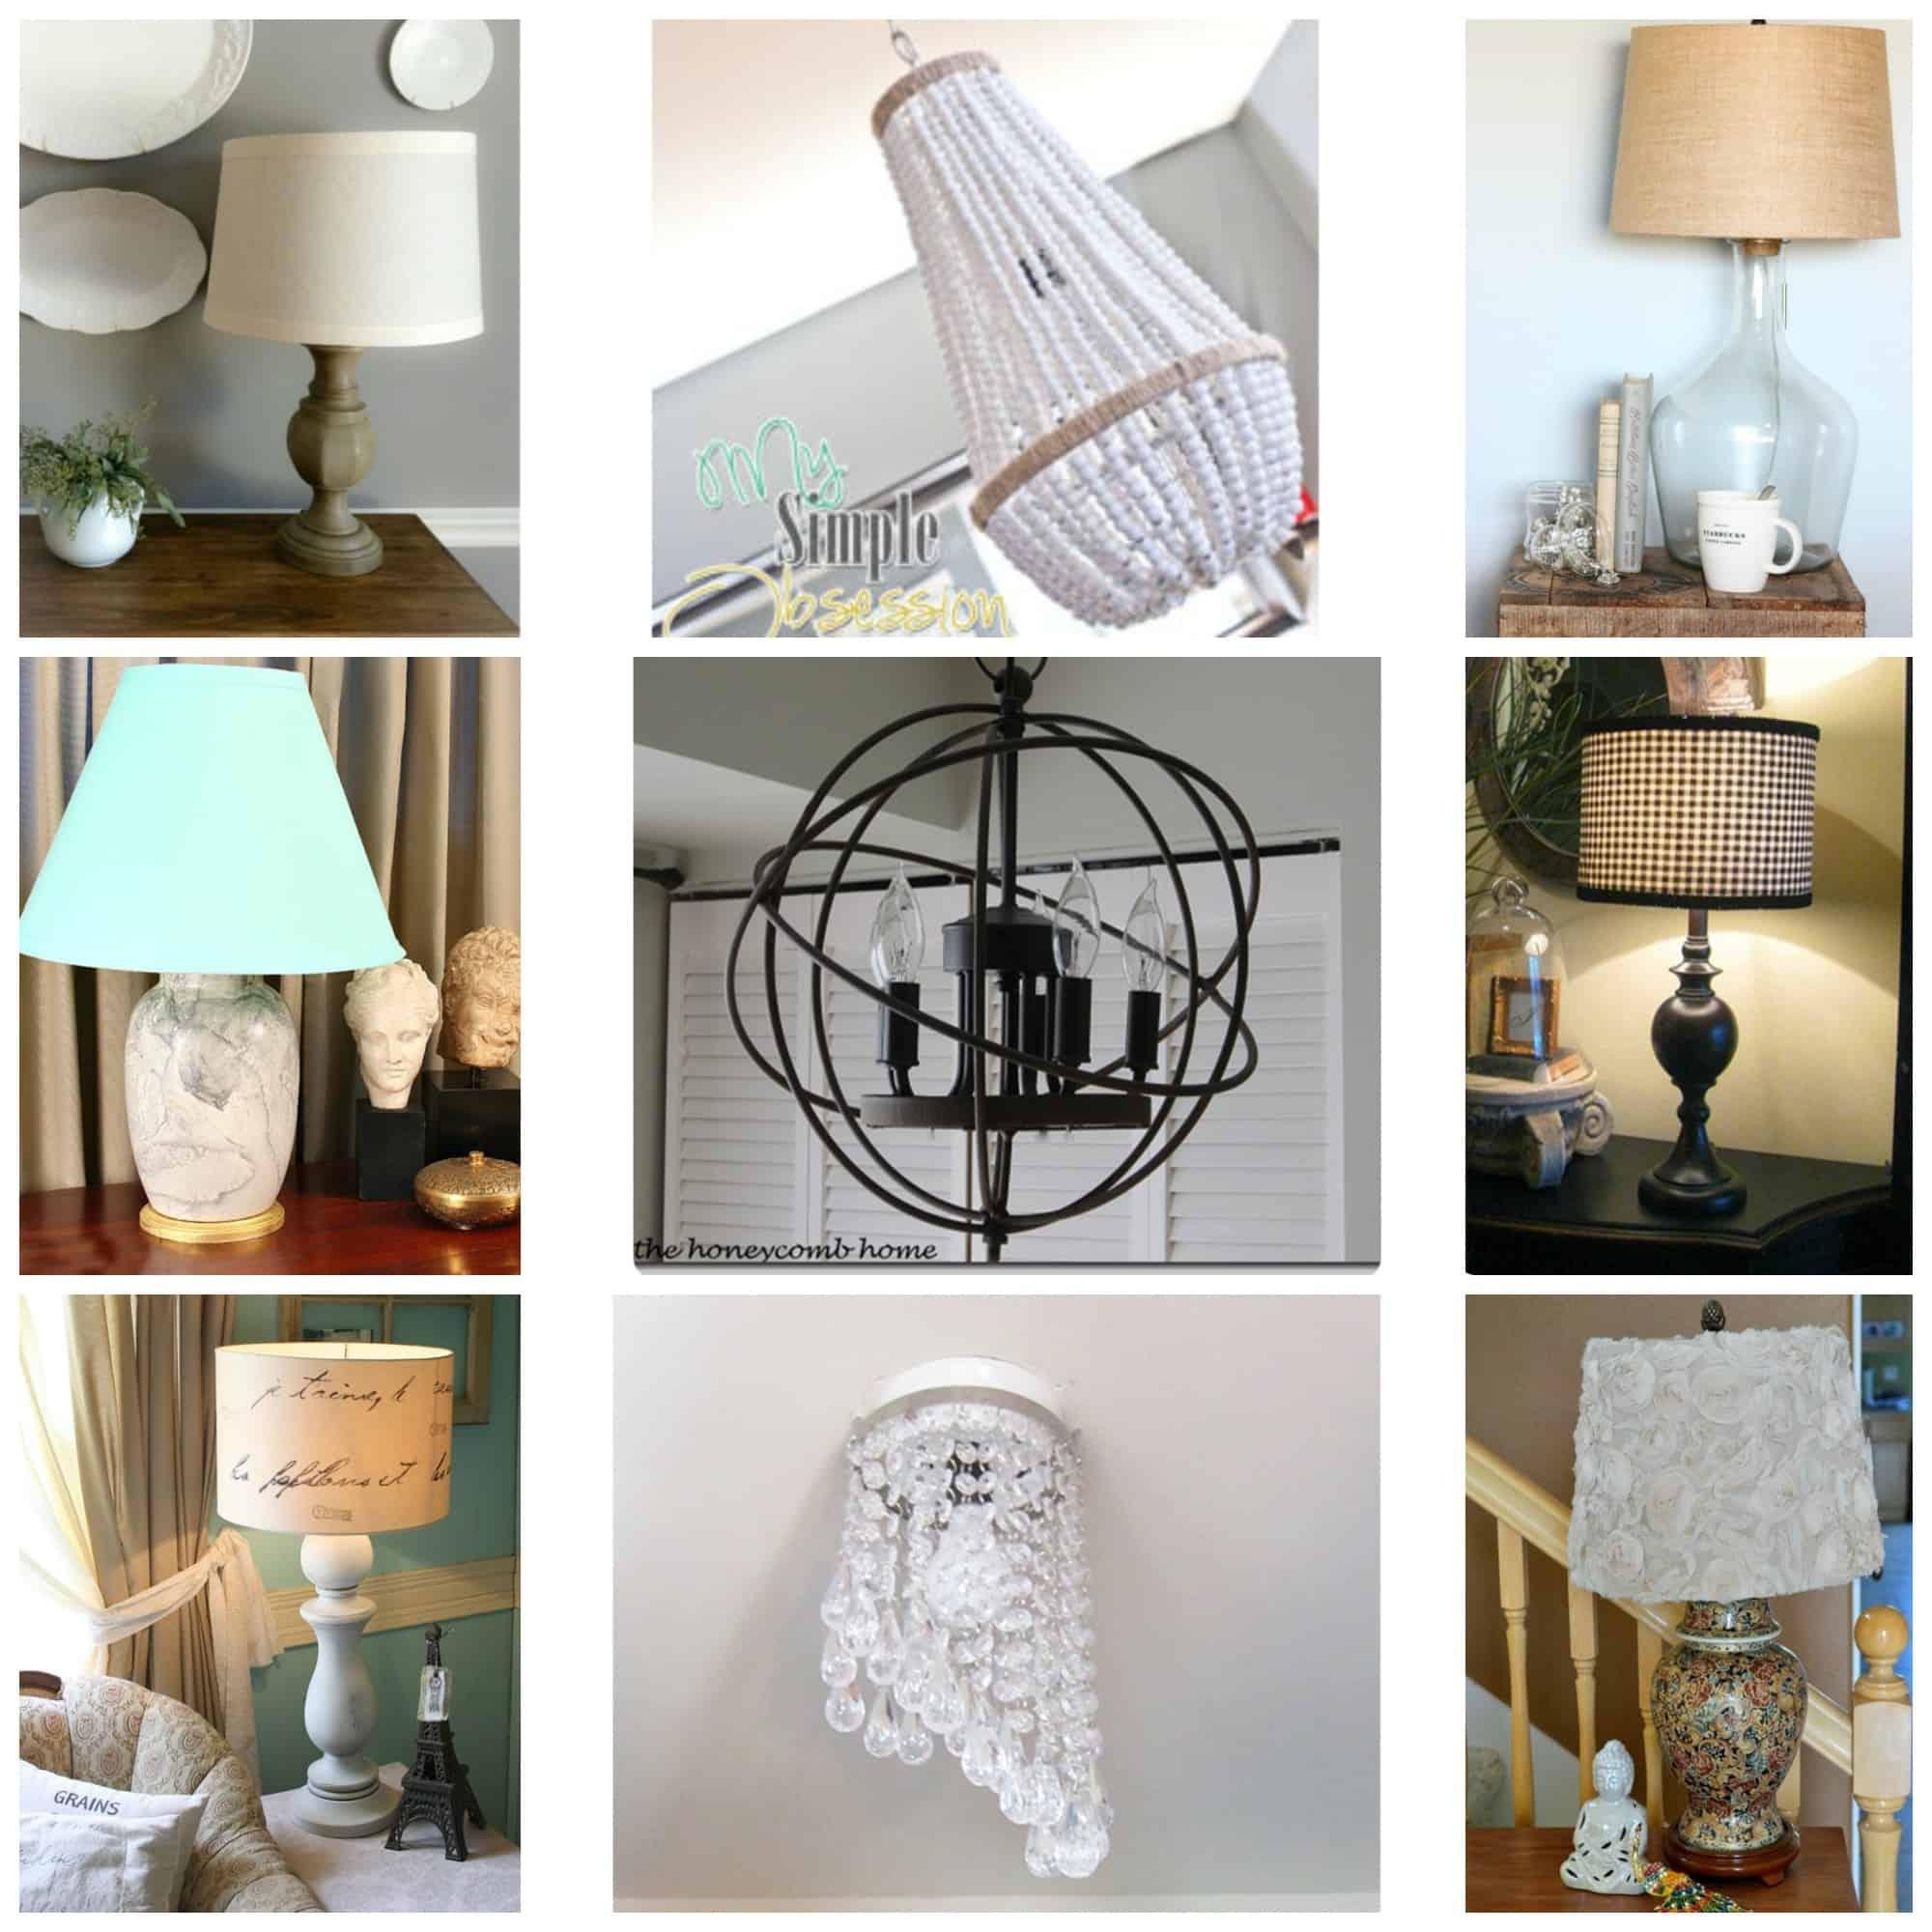 foyercollagelamps